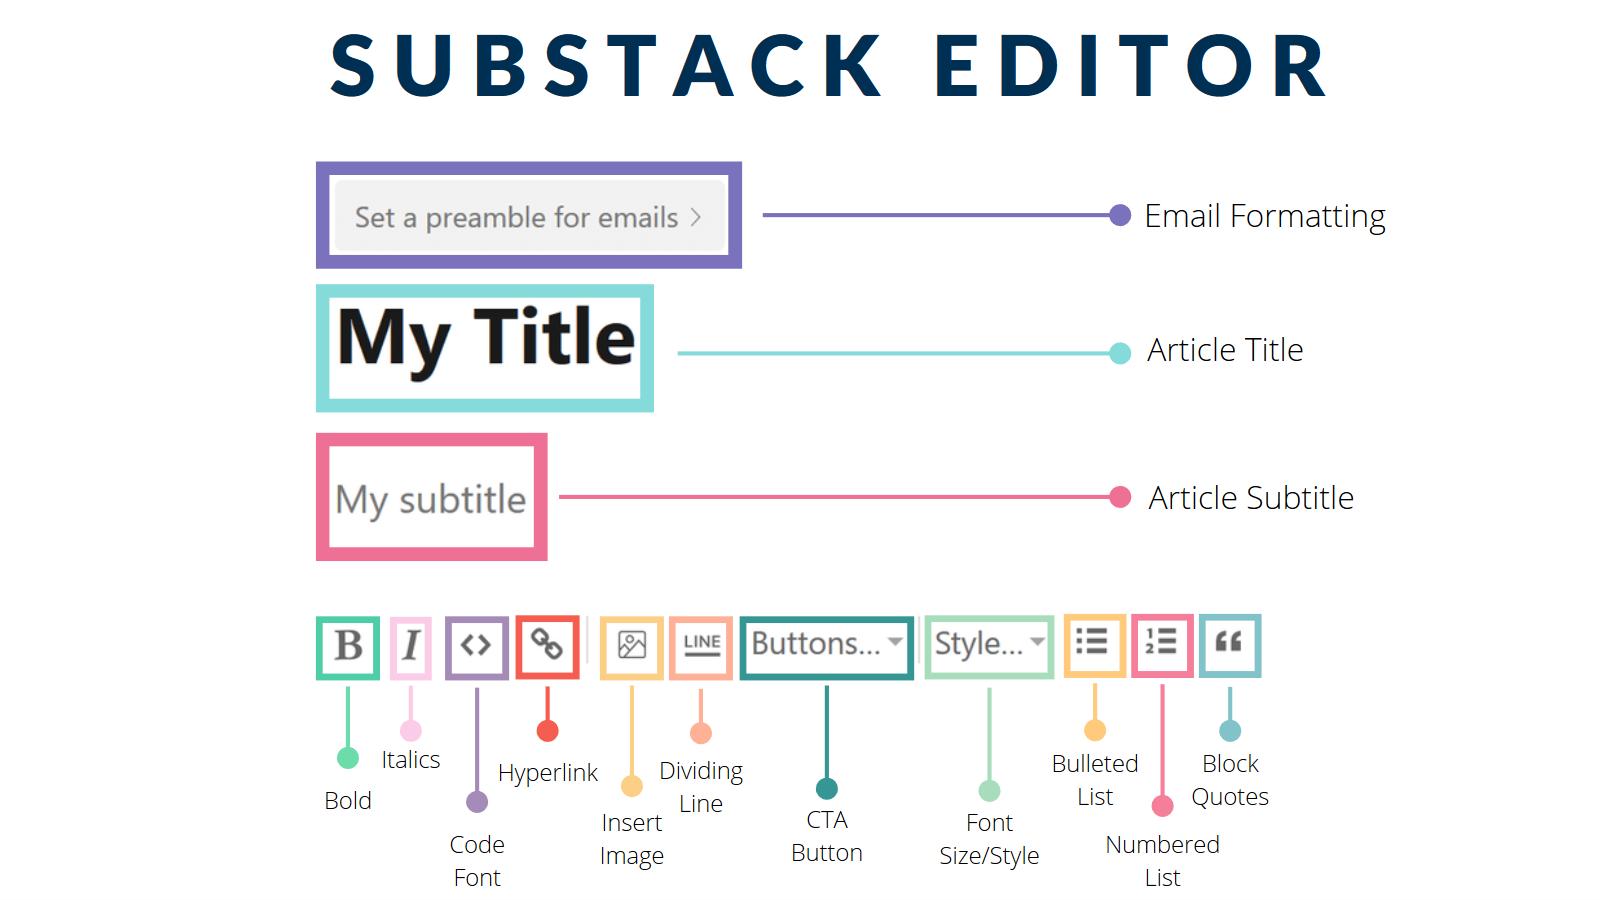 substack formatting, substack embed, substack faq, substack editor, substack newsletter, what is substack, substack review